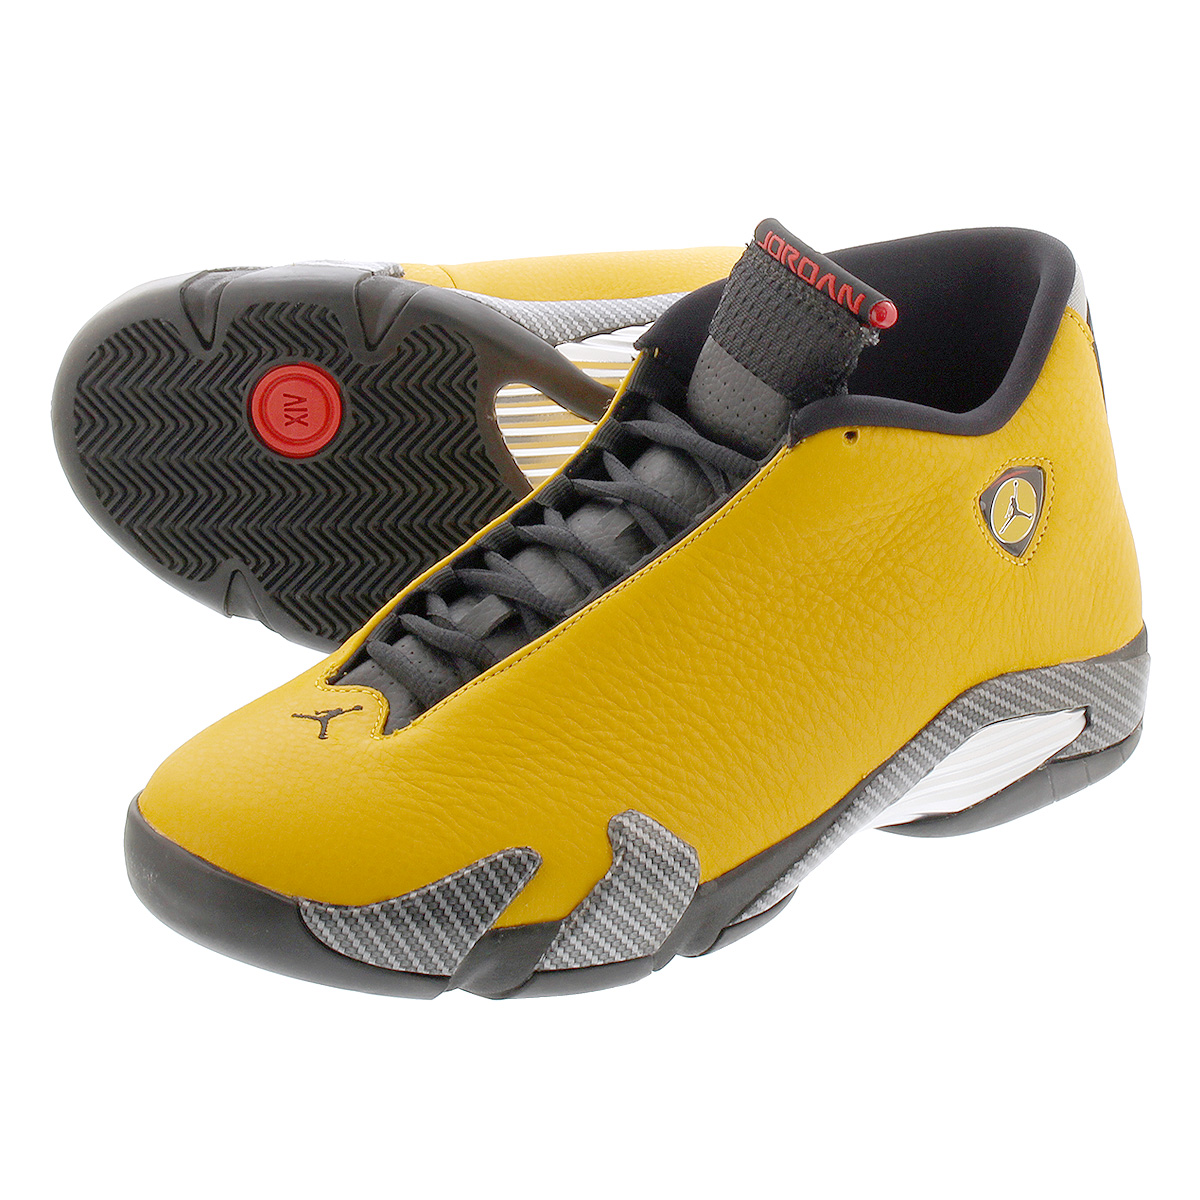 low priced a9baf e87ab NIKE AIR JORDAN 14 RETRO Nike Air Jordan 14 nostalgic UNIVERSITY  GOLD/BLACK/RED bq3685-706